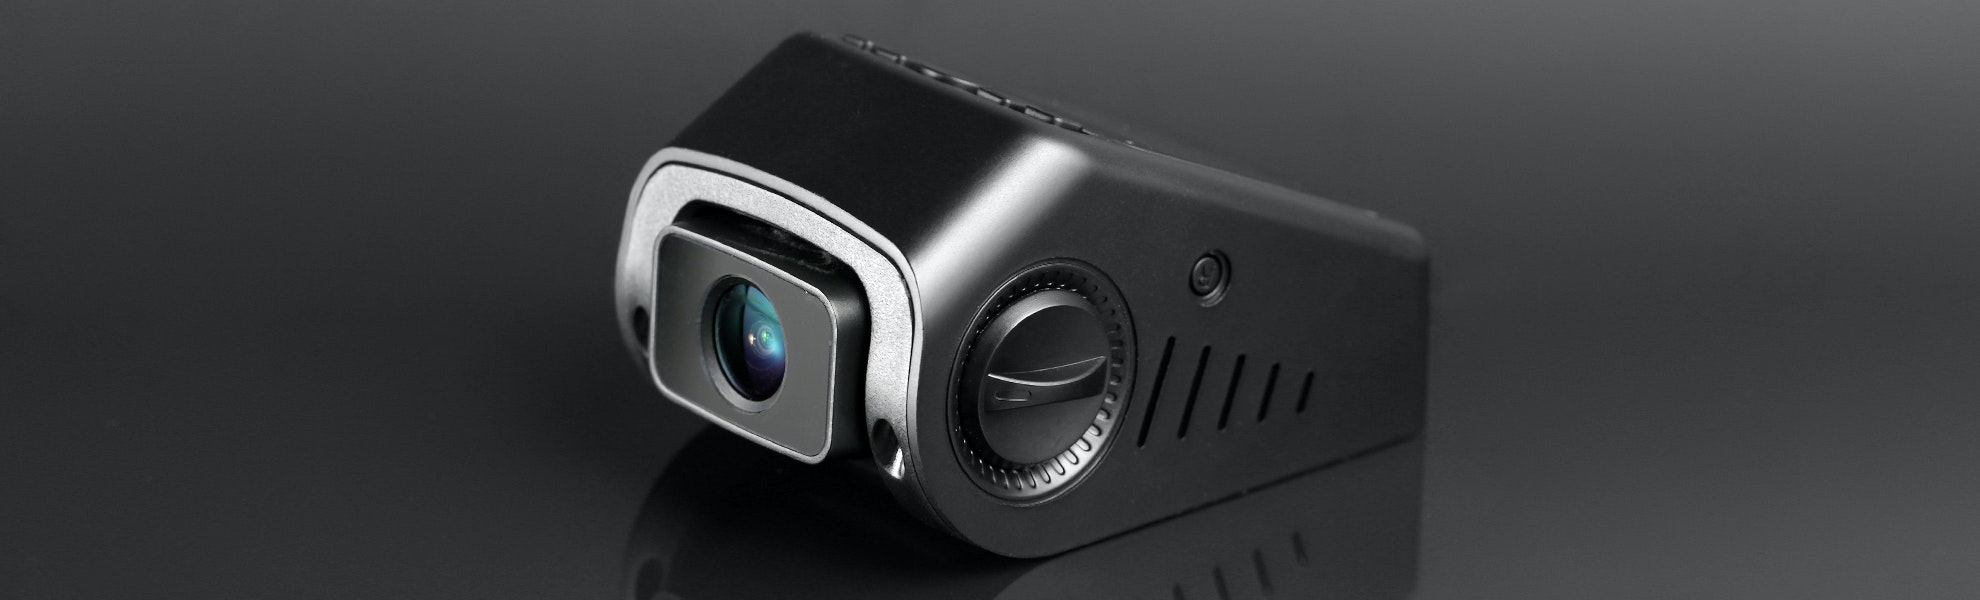 Street Guardian Dash Camera V2 (SG9665GC)